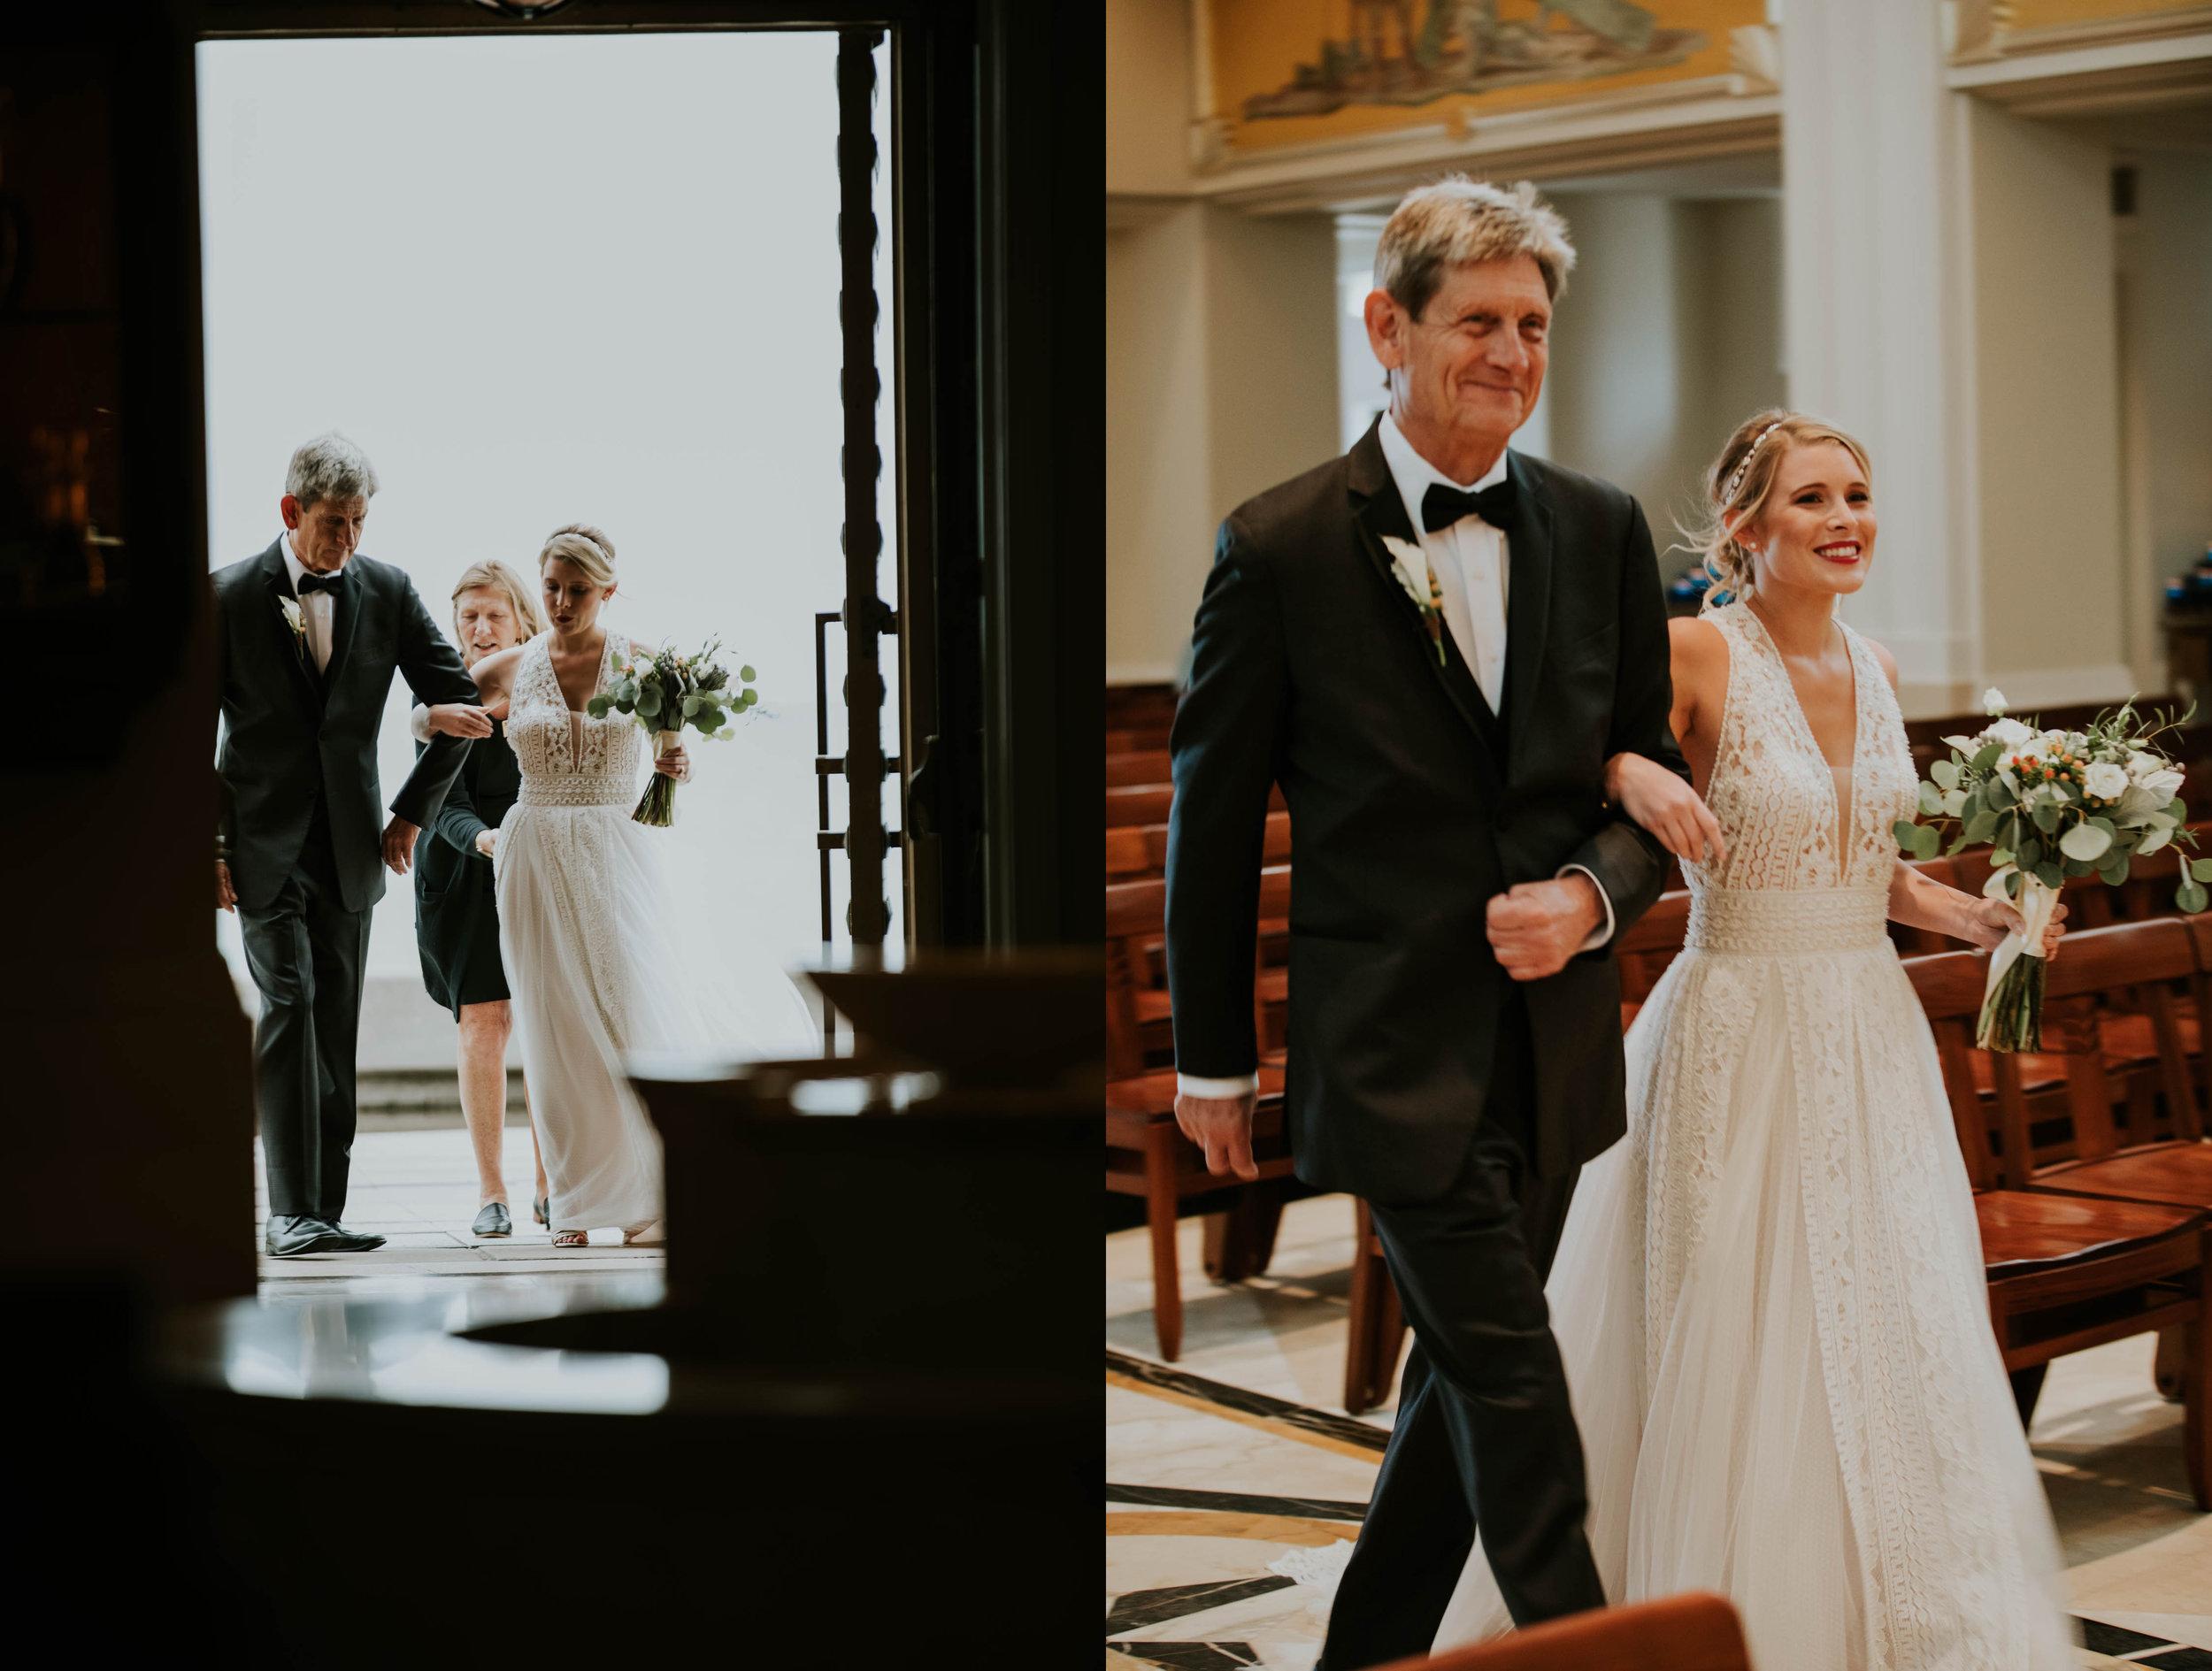 Jenero Wedding 100618-187 copy.jpg